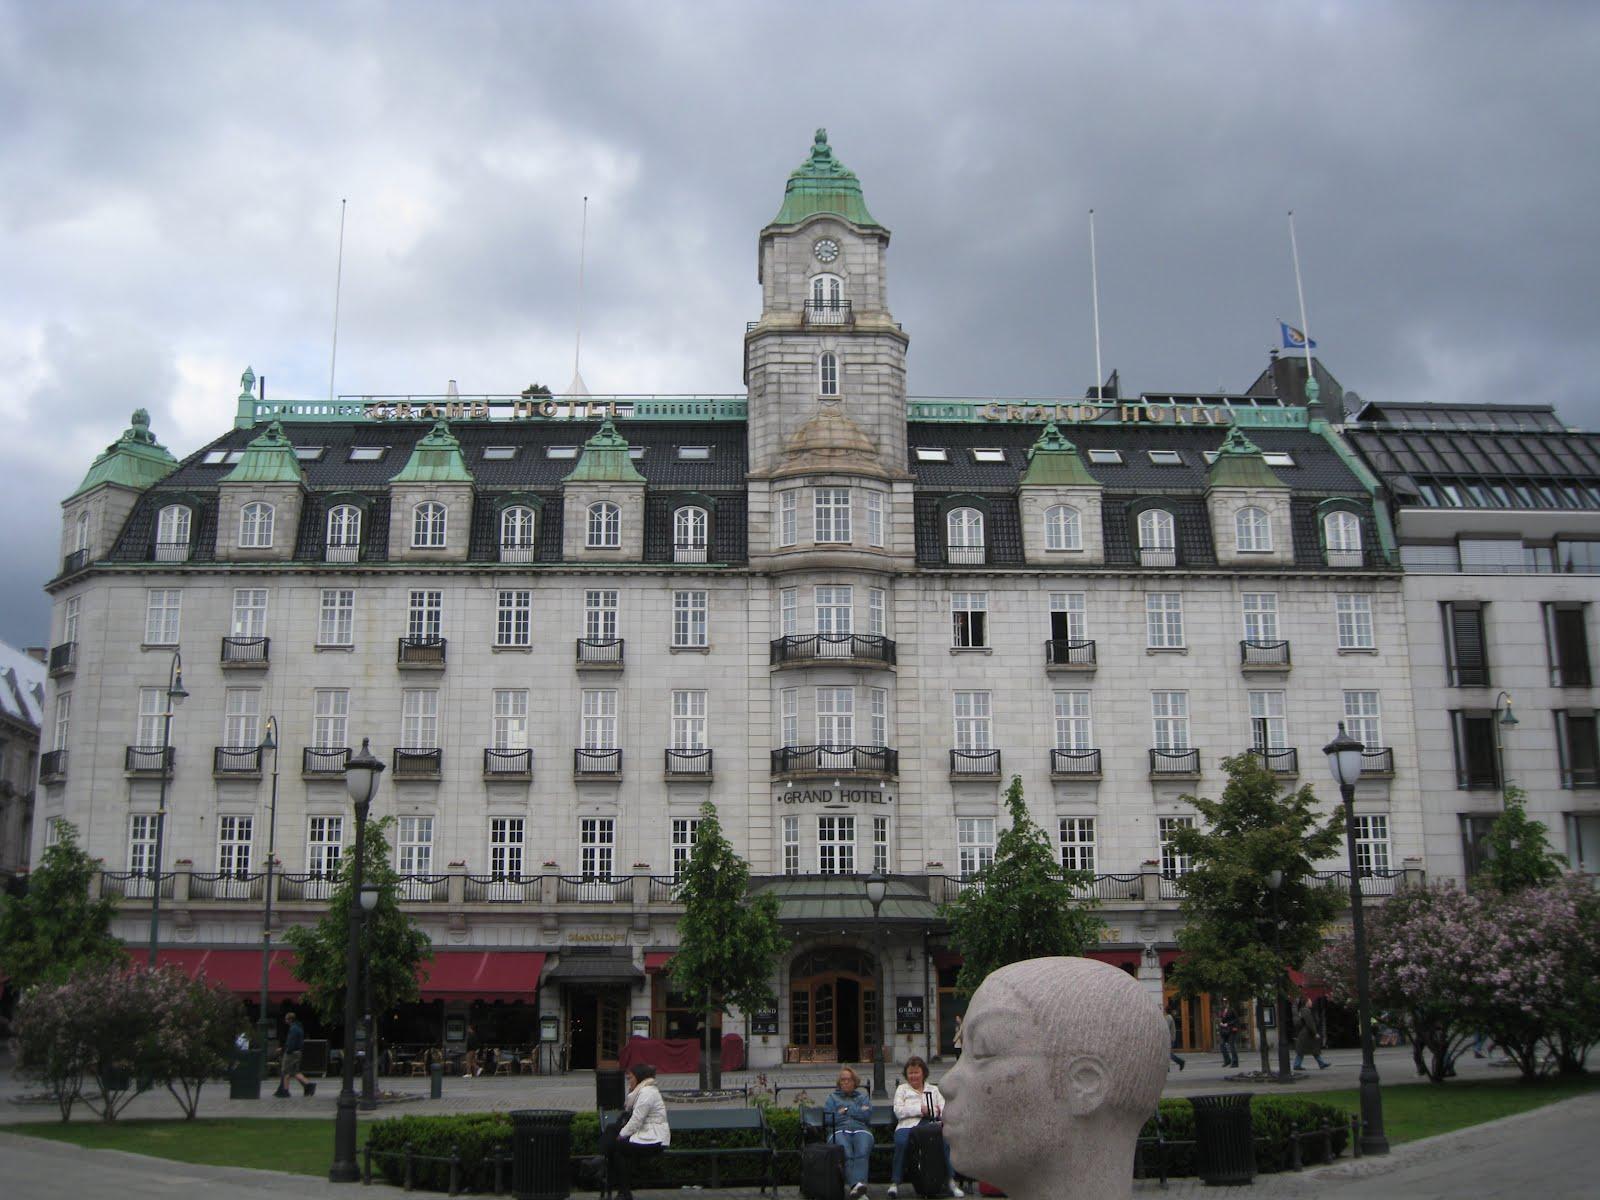 hotell 33 oslo norsk porno bilder